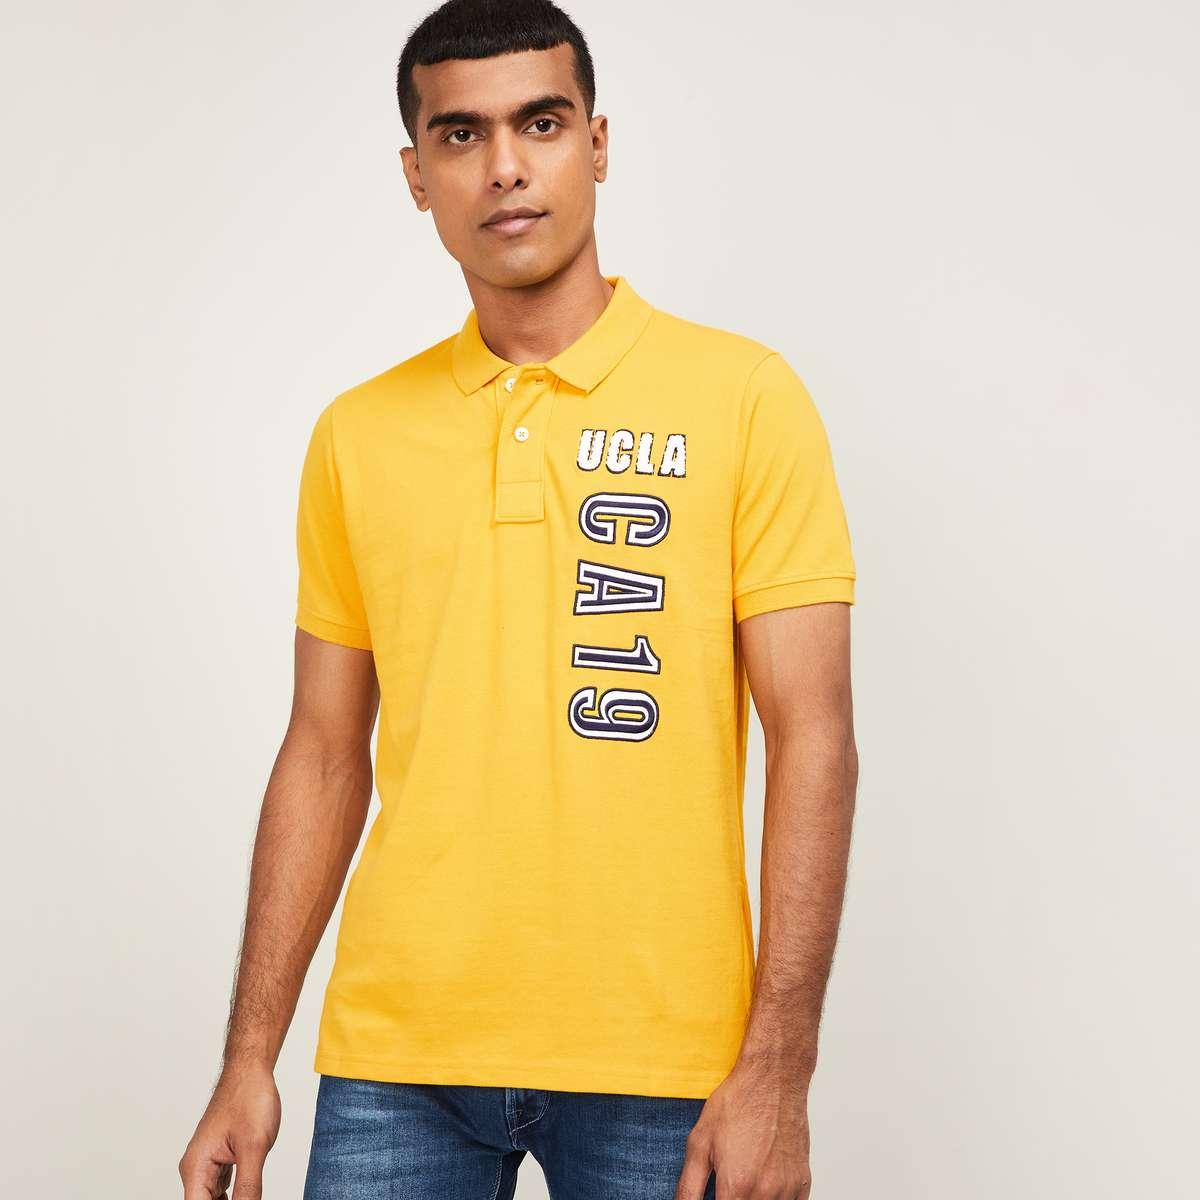 2.UCLA Men Typographic Print Regular Fit Polo T-shirt